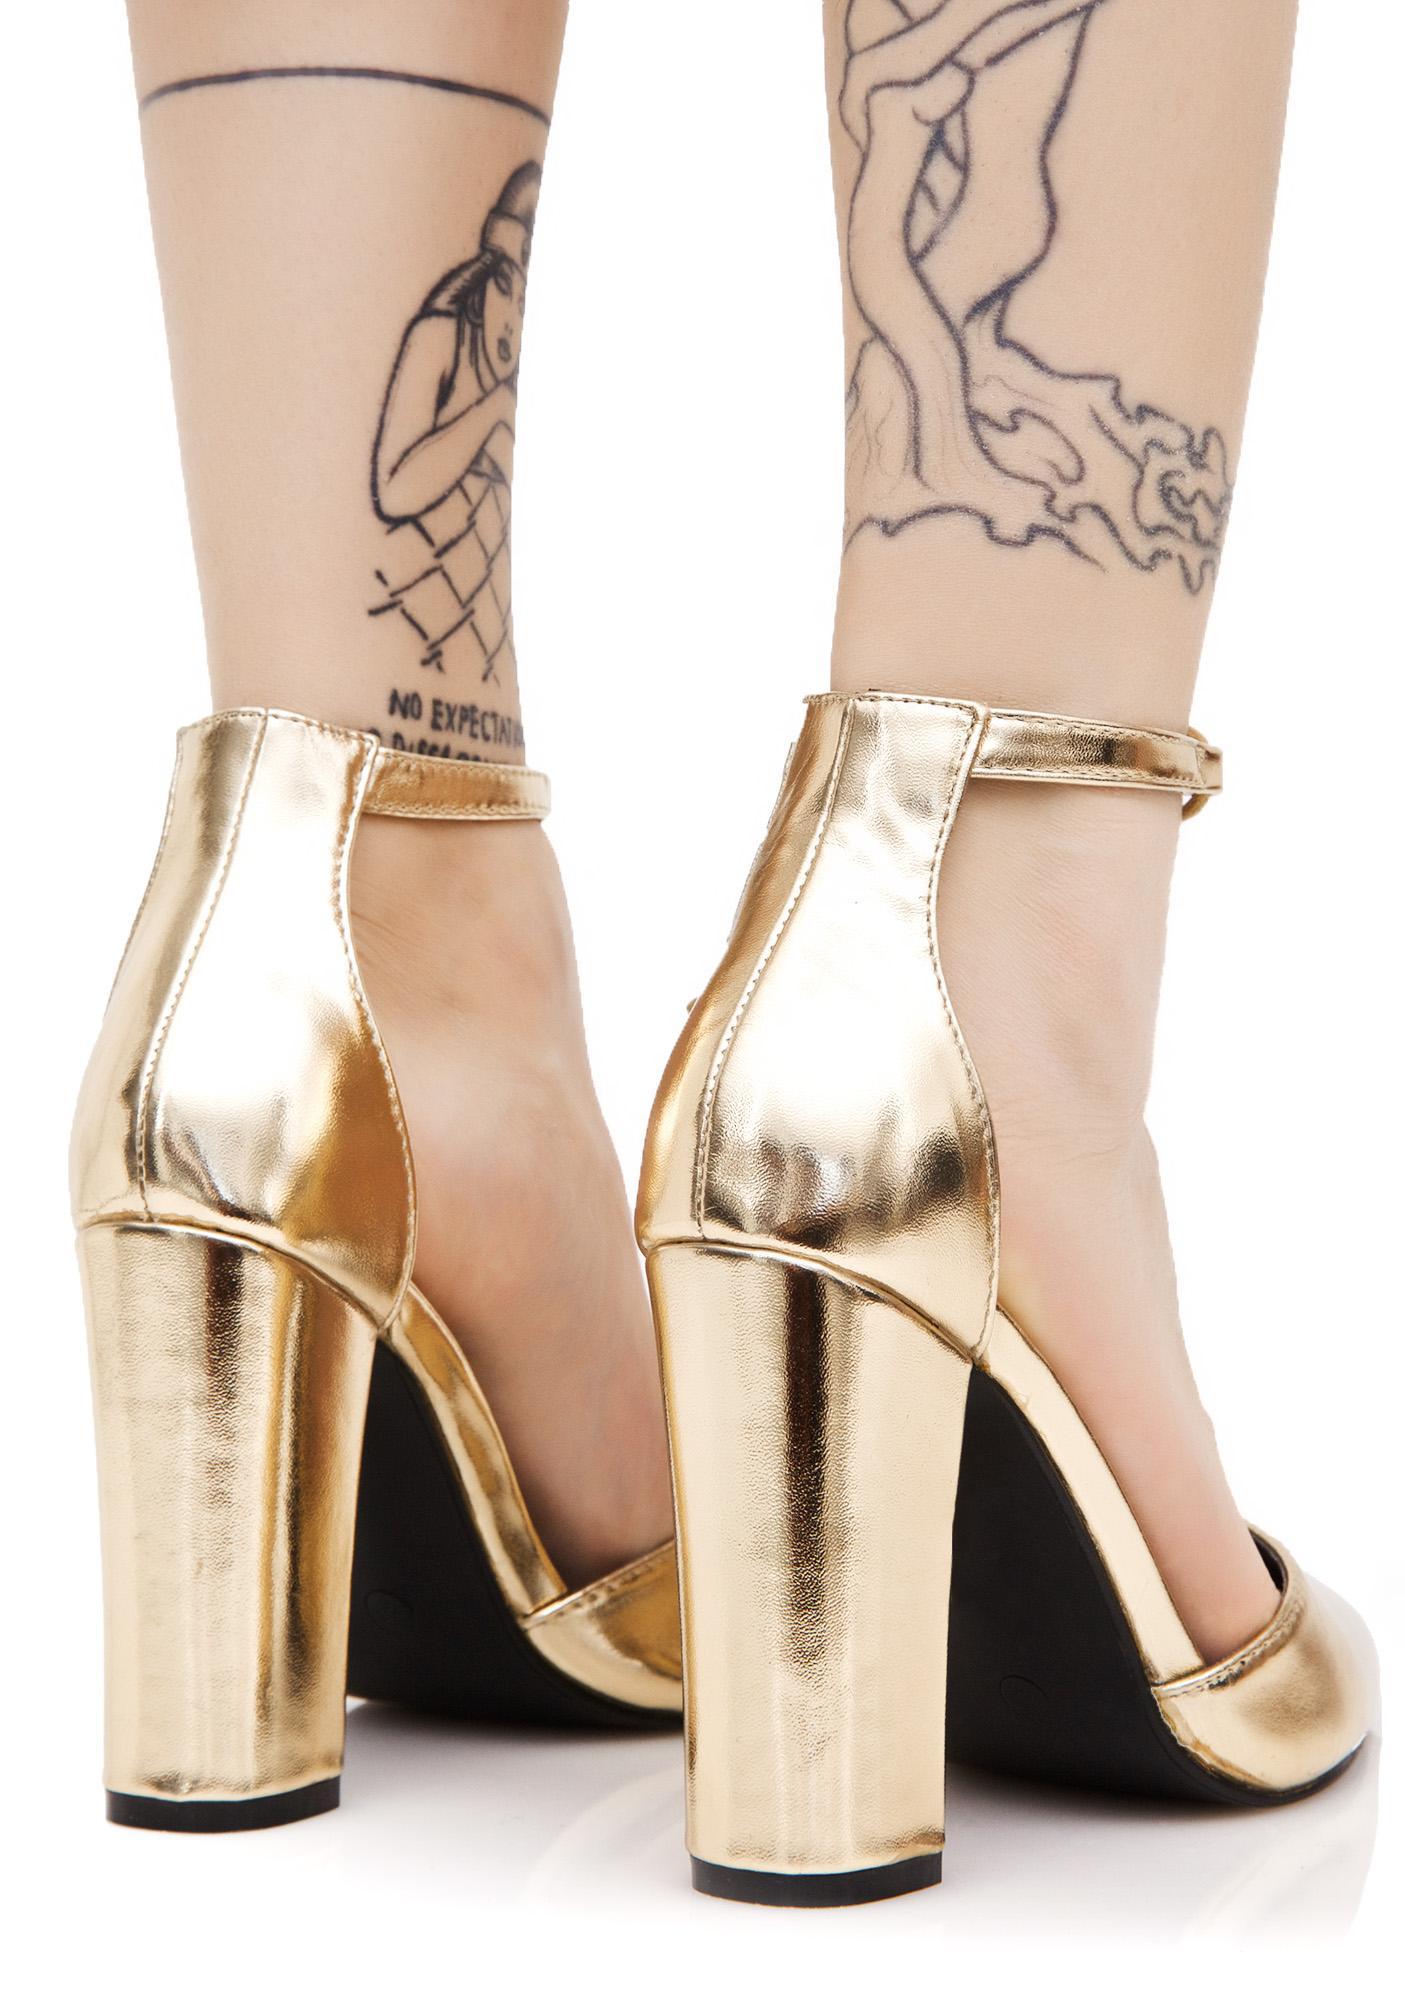 Étoile Heels